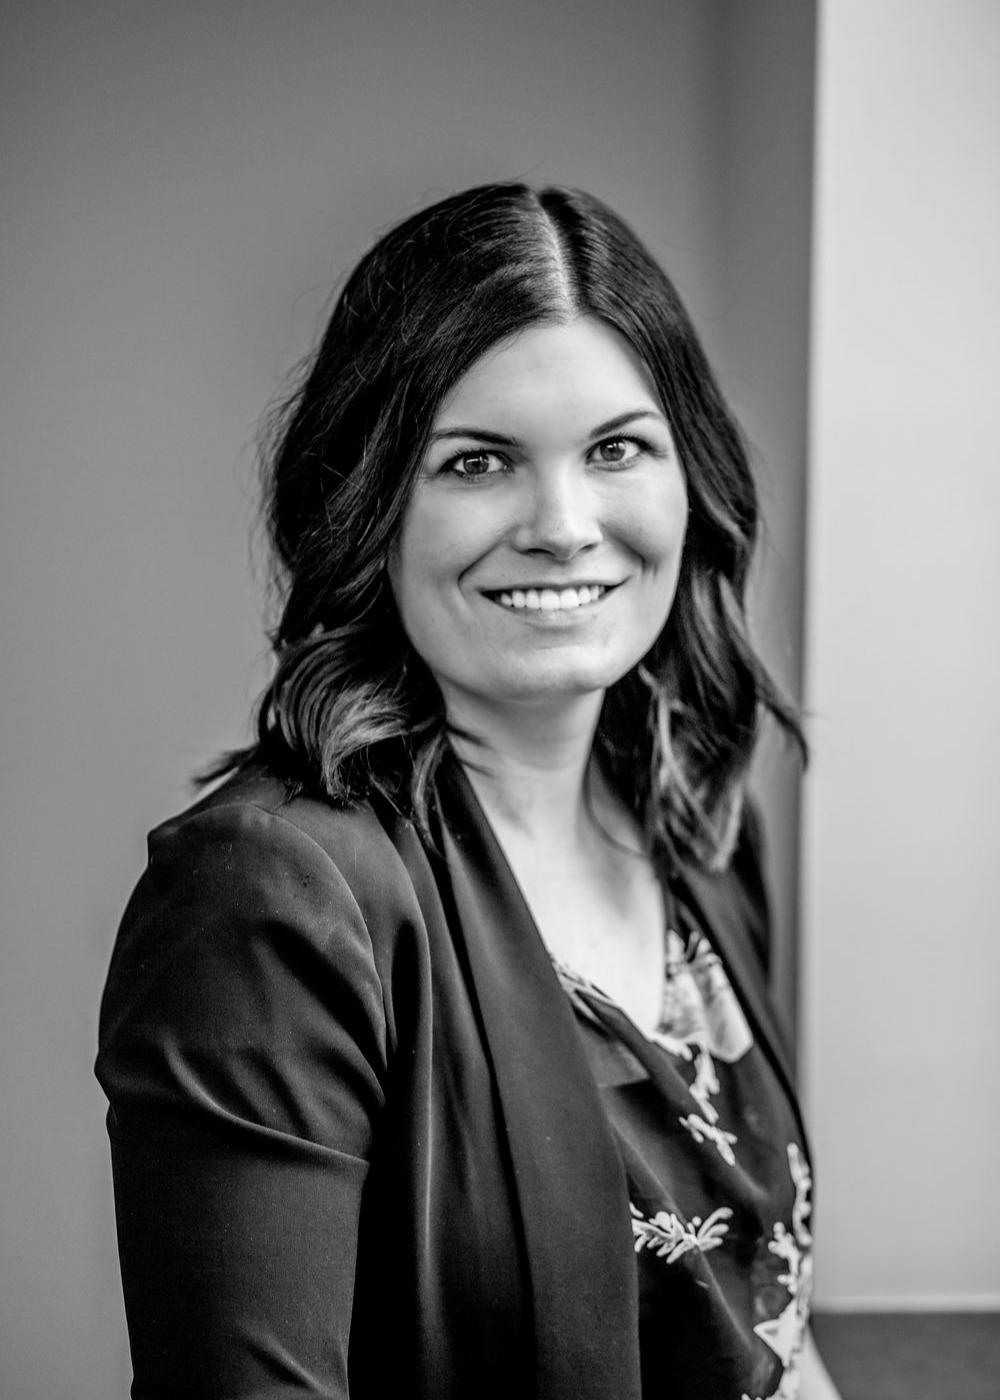 Paige Koch Photo